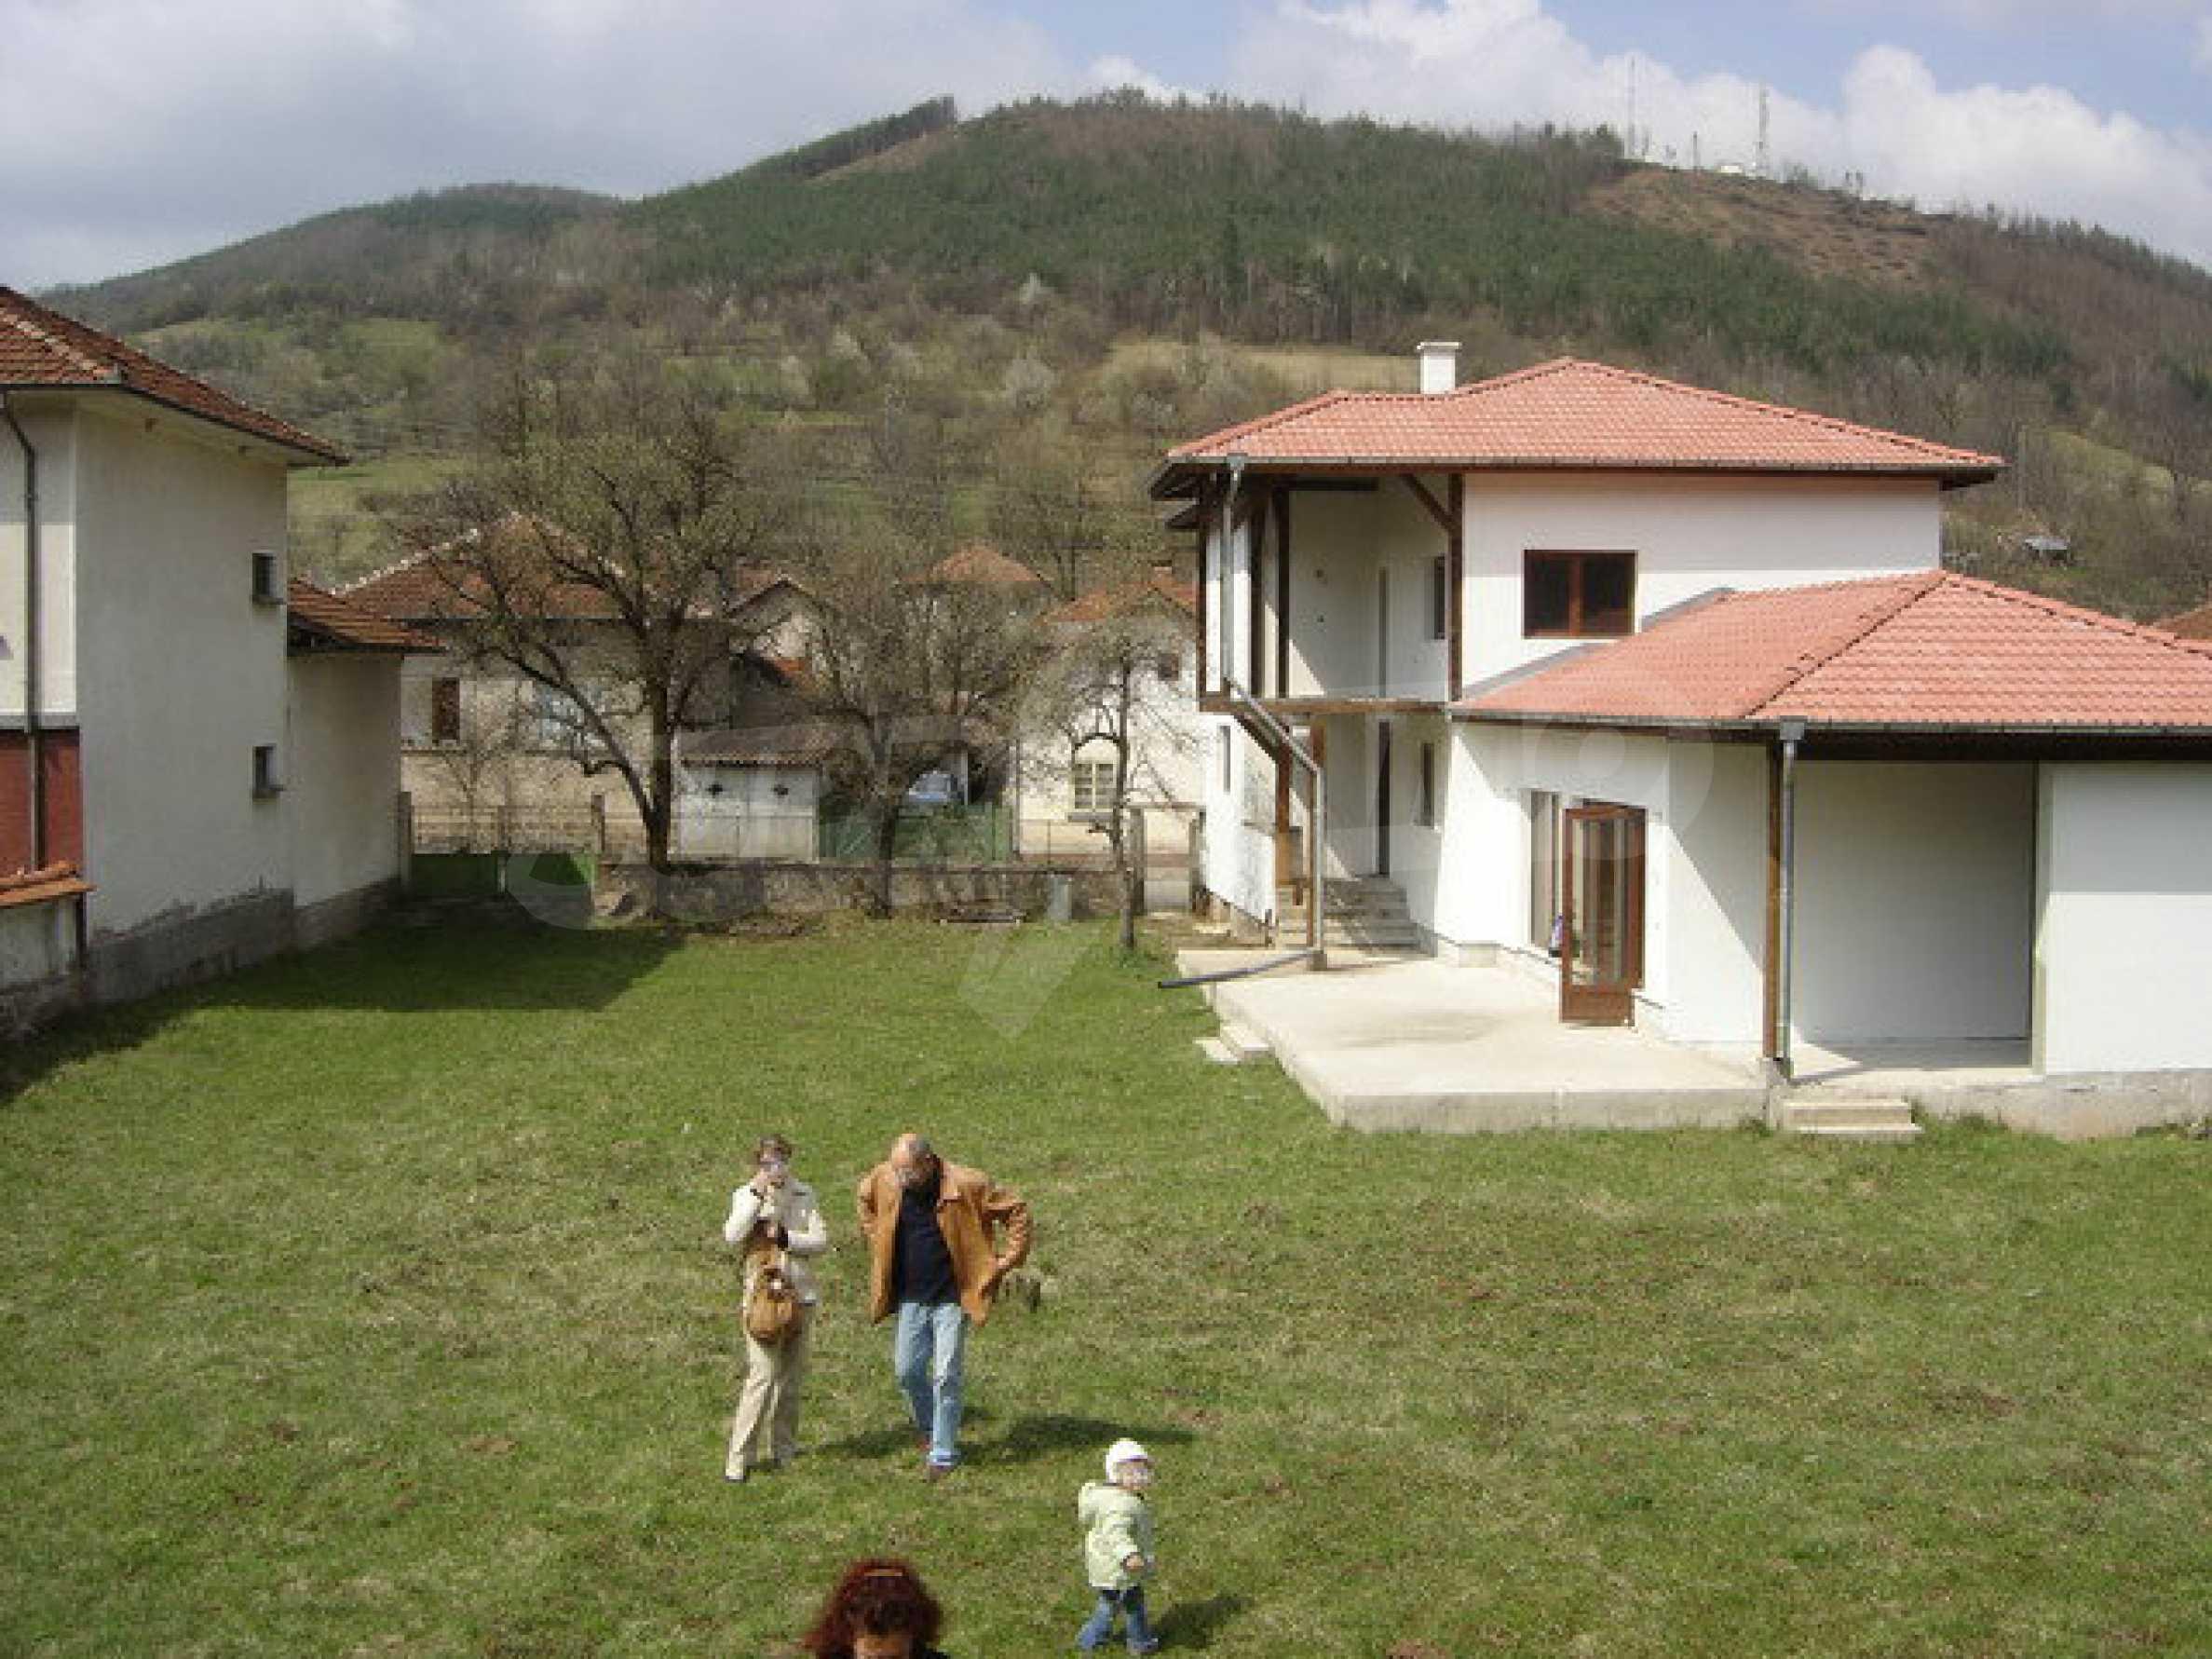 Two storey house in village near Sopot Dam 7